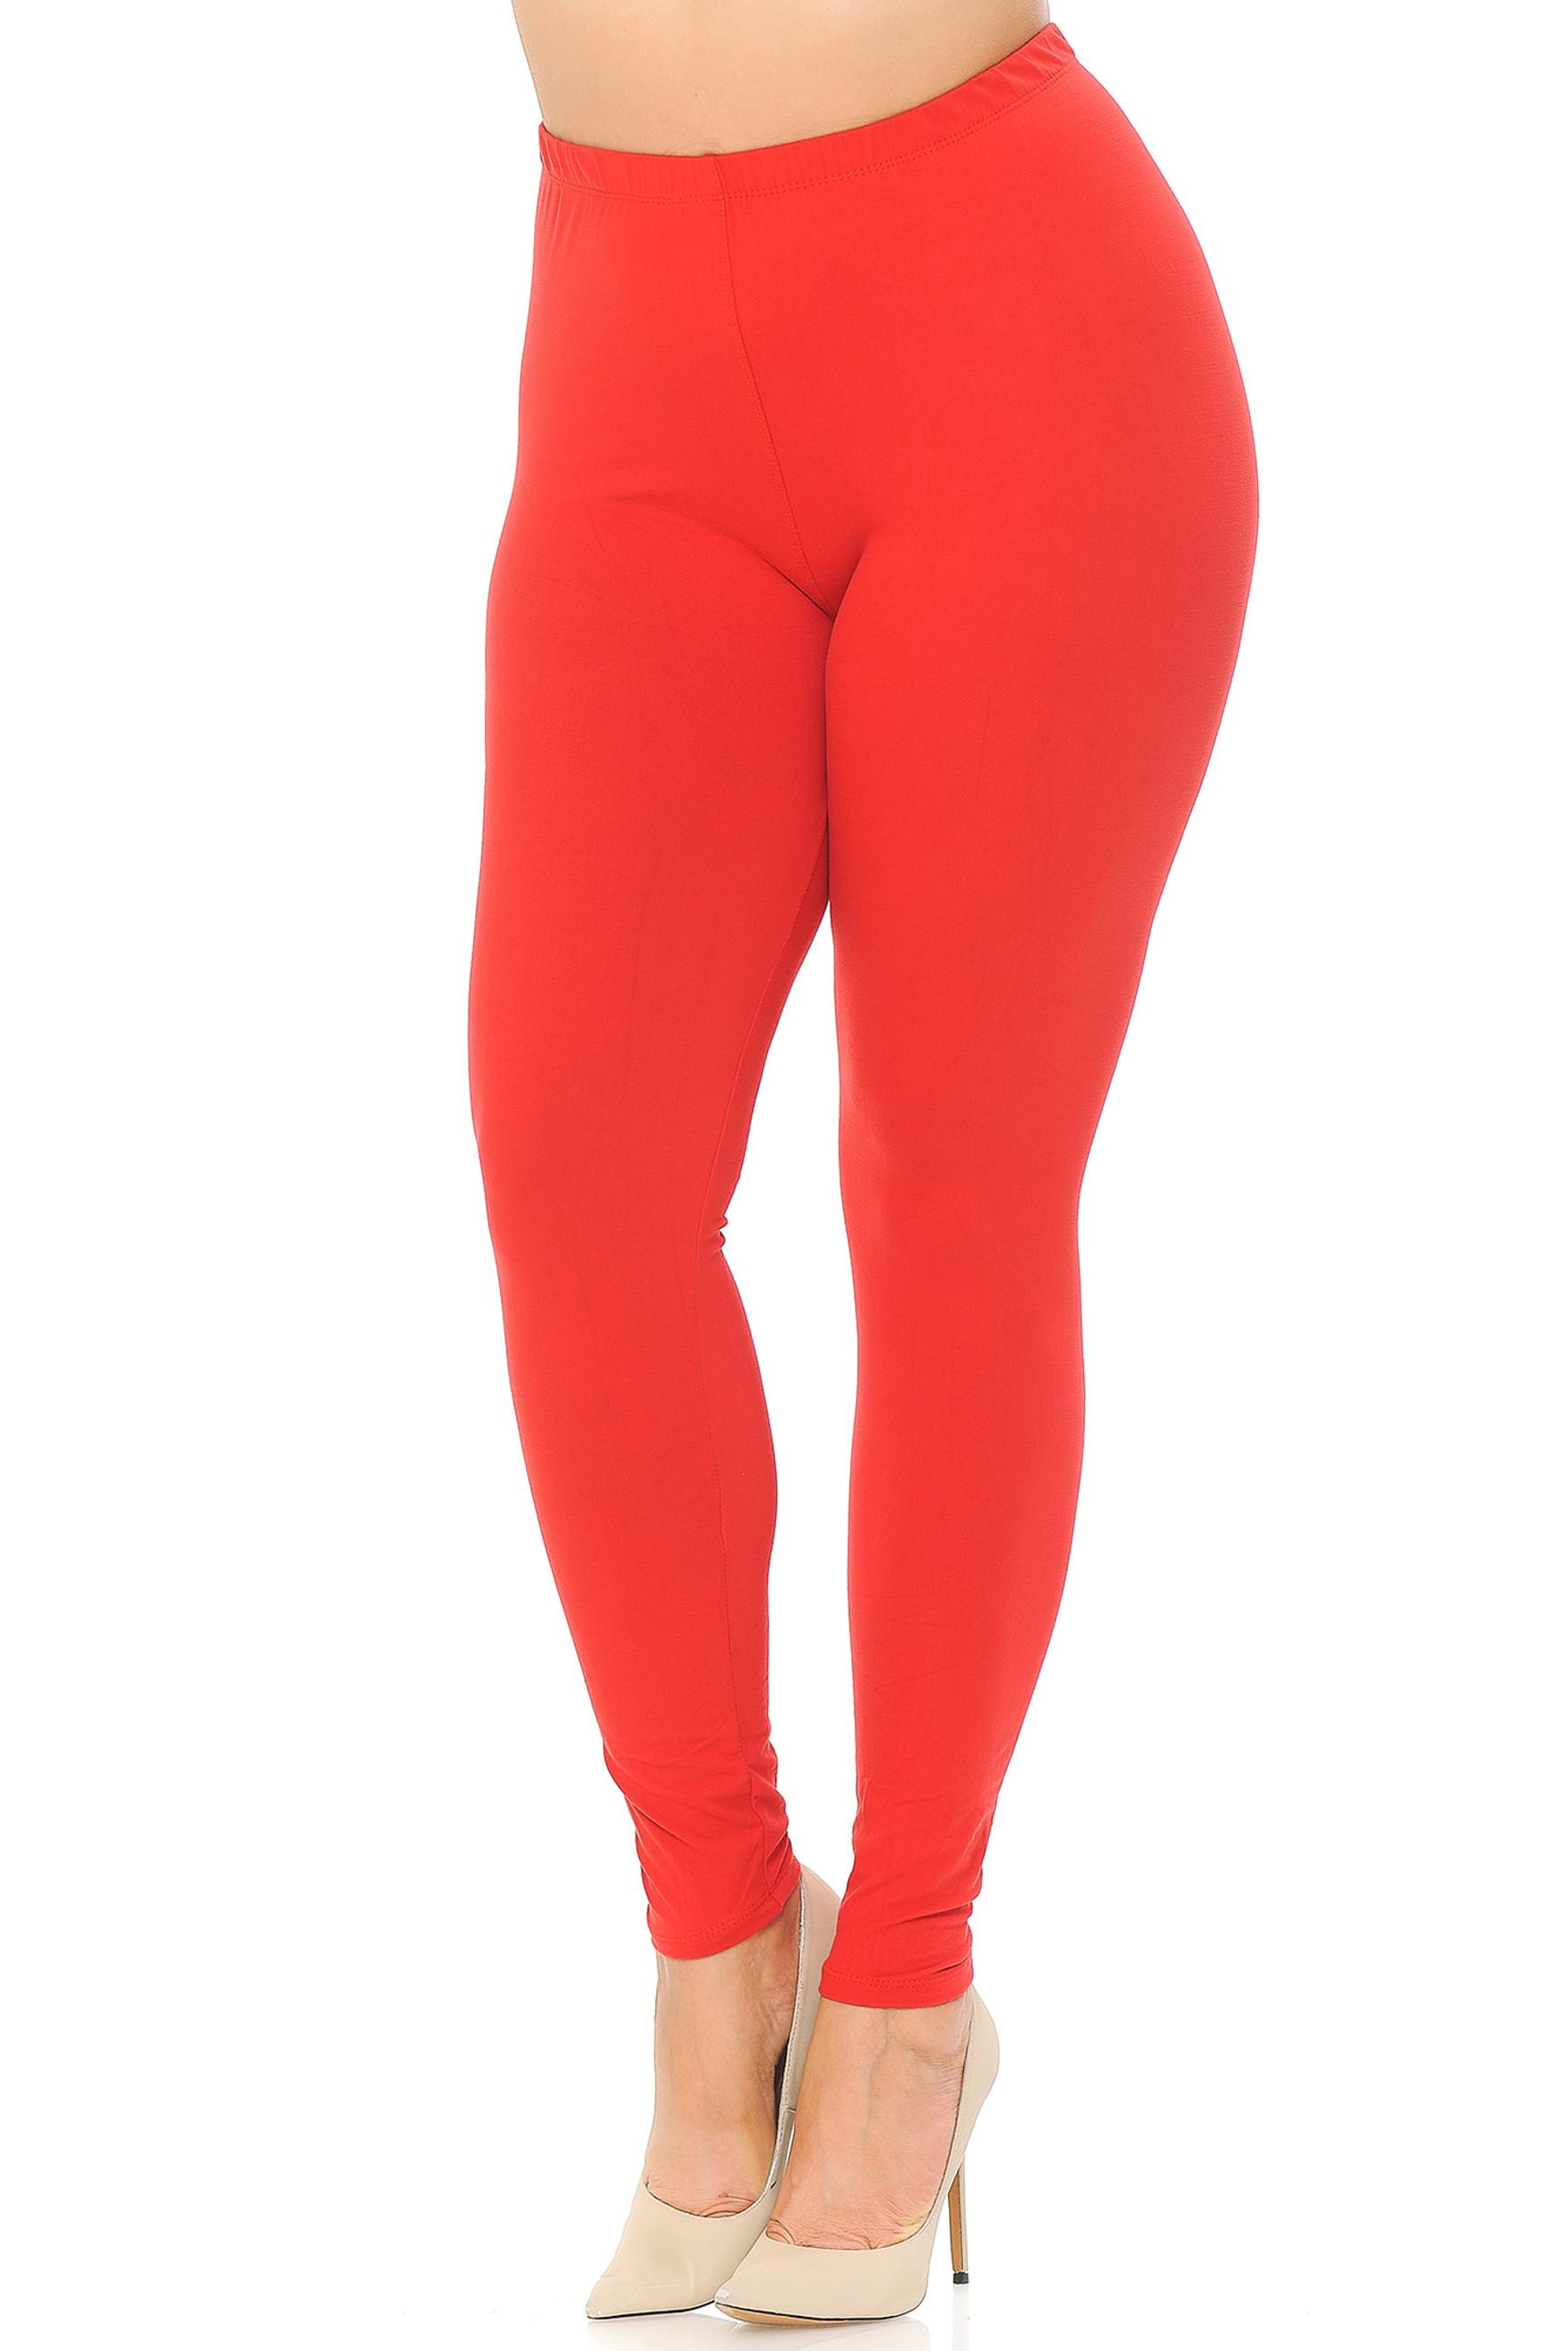 Red Main Brushed Basic Solid Plus Size Leggings - EEVEE